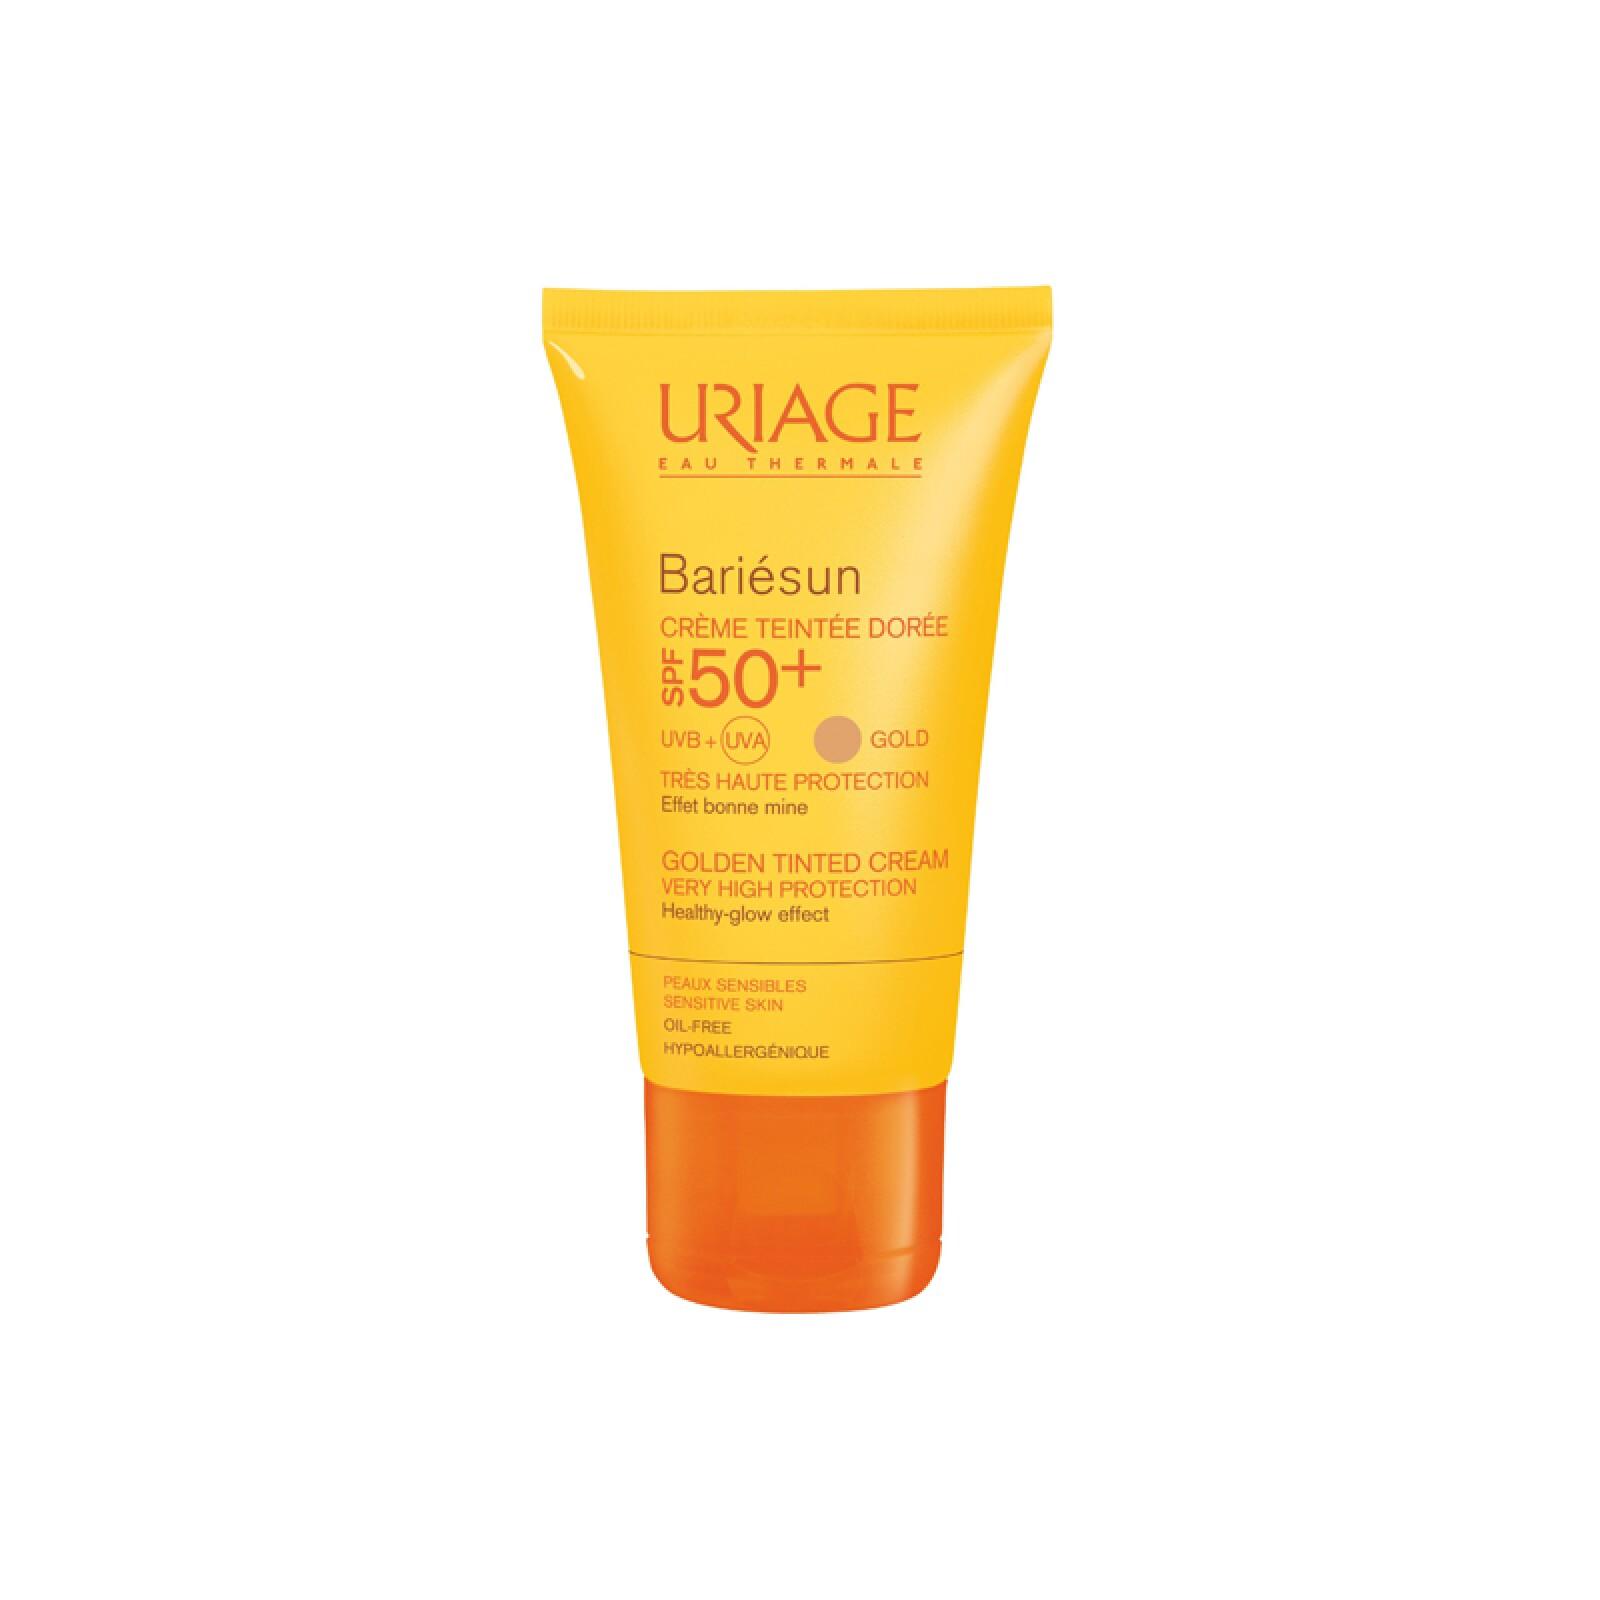 Uriage-SPF-50-Golden-Tinted-Cream.jpg